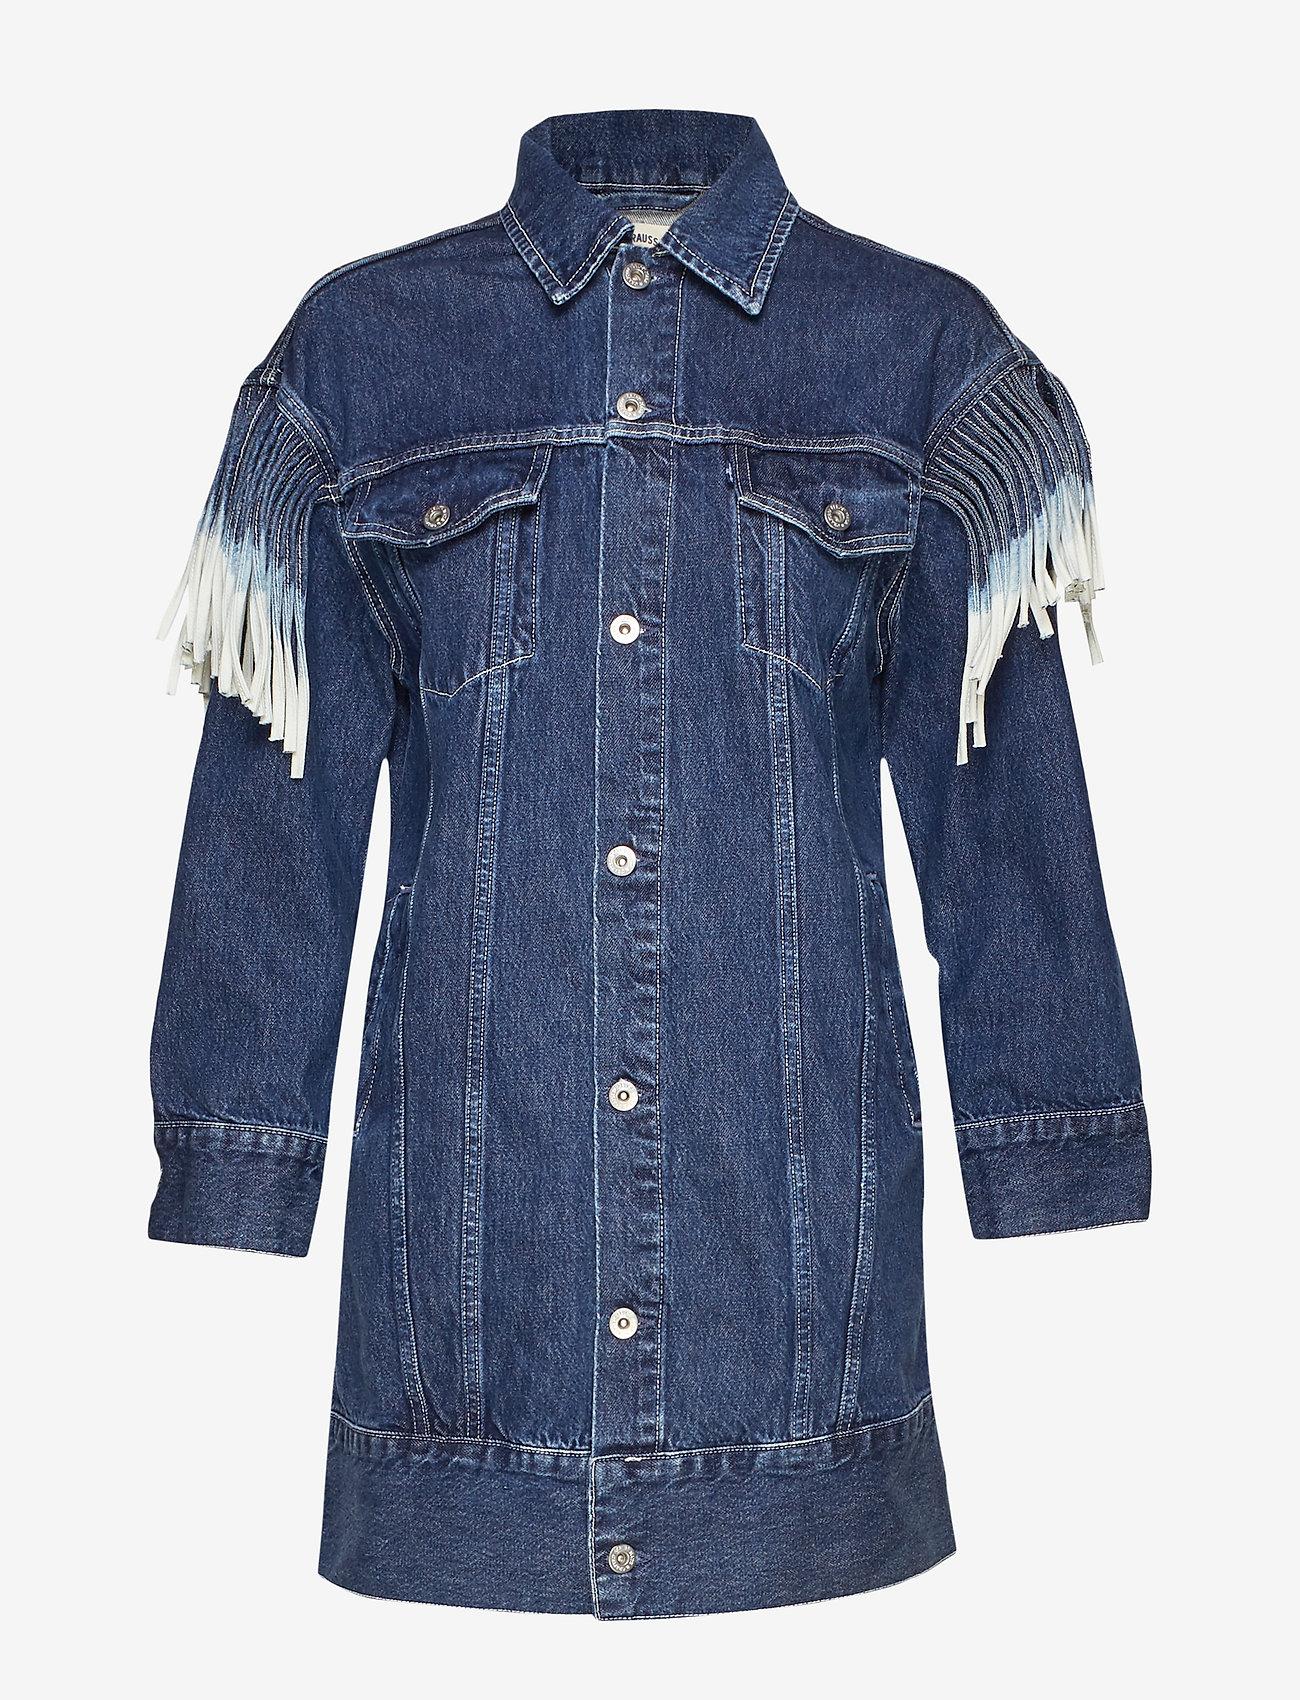 Levi's Made & Crafted - LMC OVRSZD RANCH DRESS LMC RIG - shirt dresses - dark indigo - flat finish